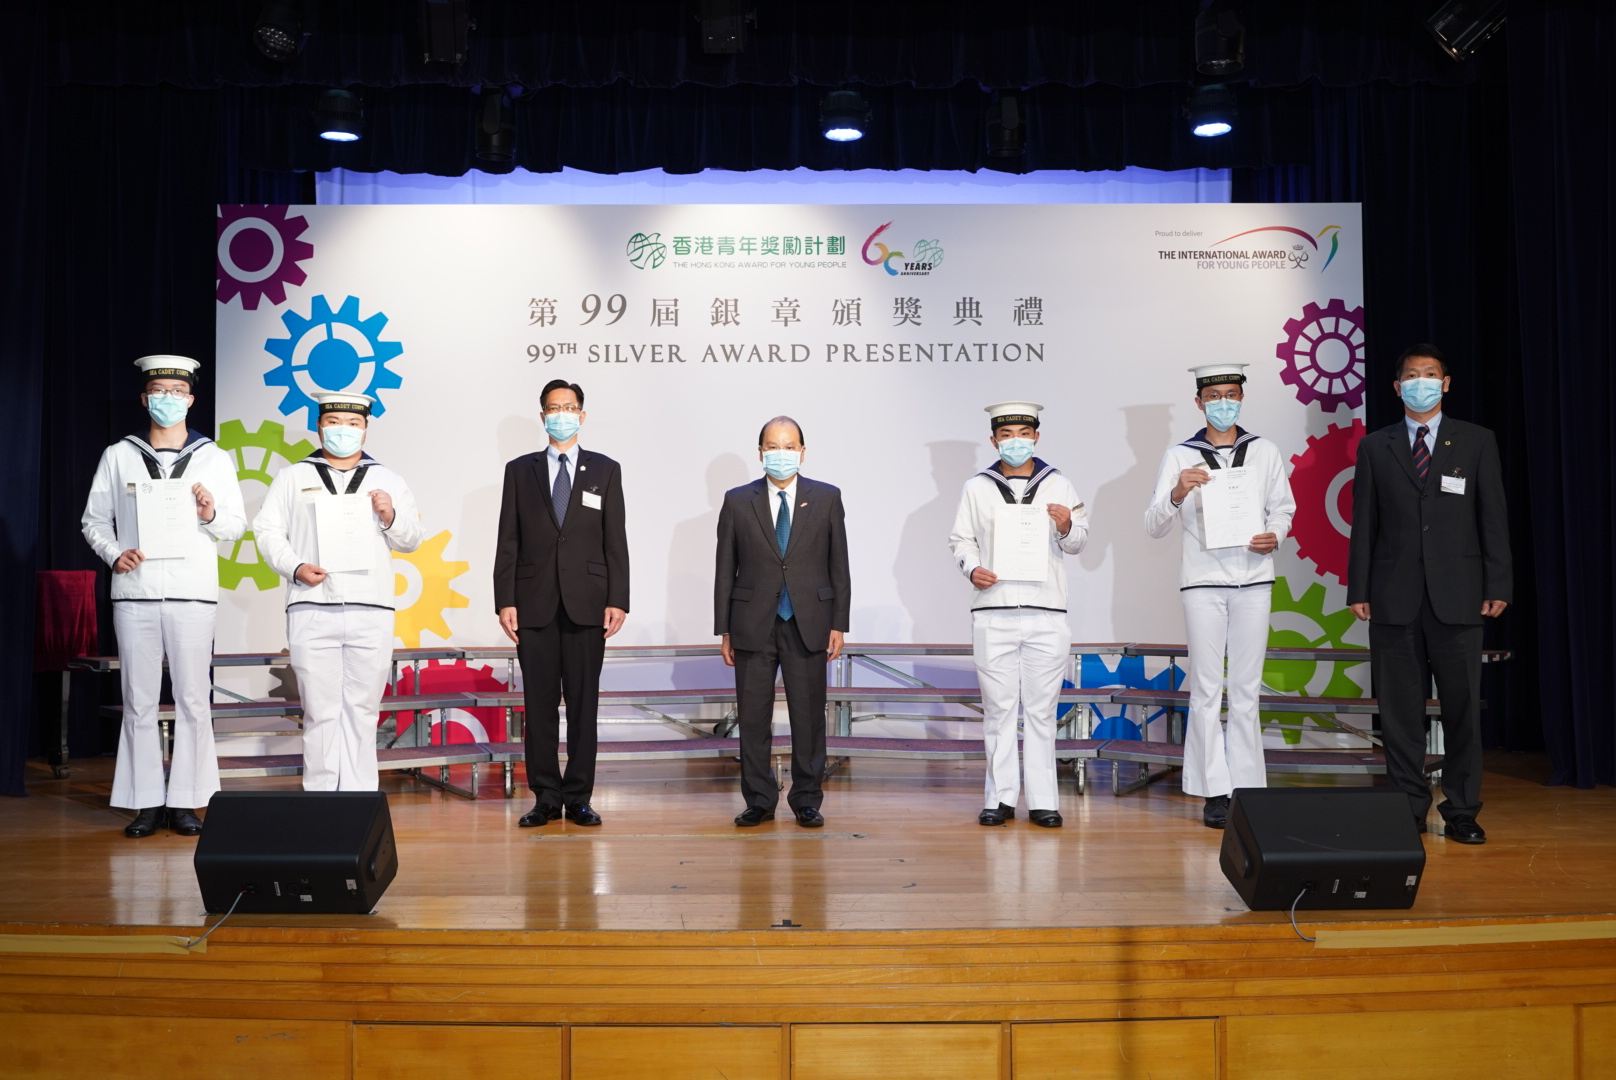 The 99th Silver Award Presentation (19/04/2021)